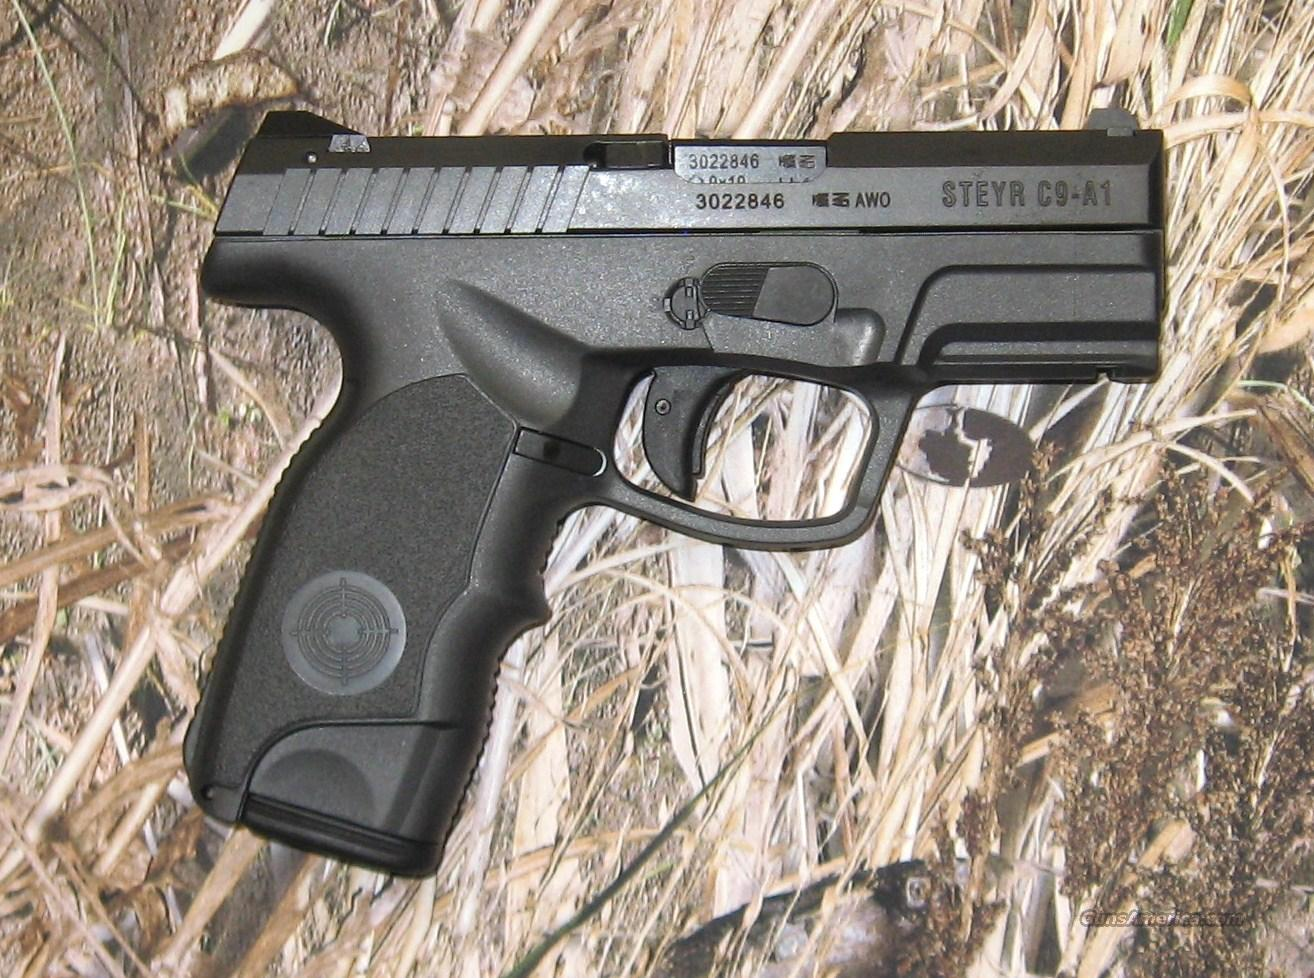 Steyr C9- A1 New Model 9mm